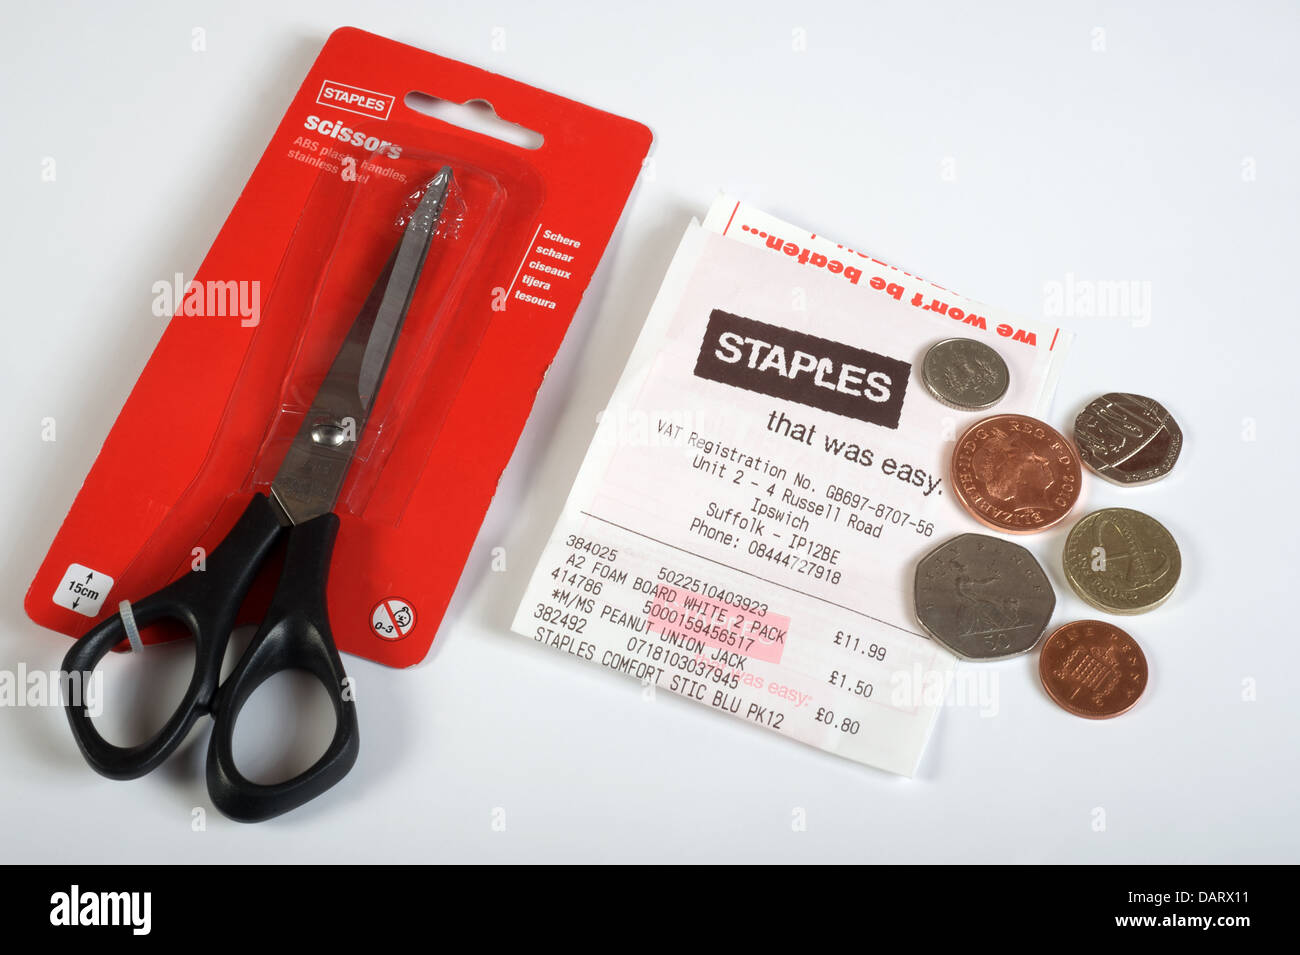 Staples scissors - Stock Image